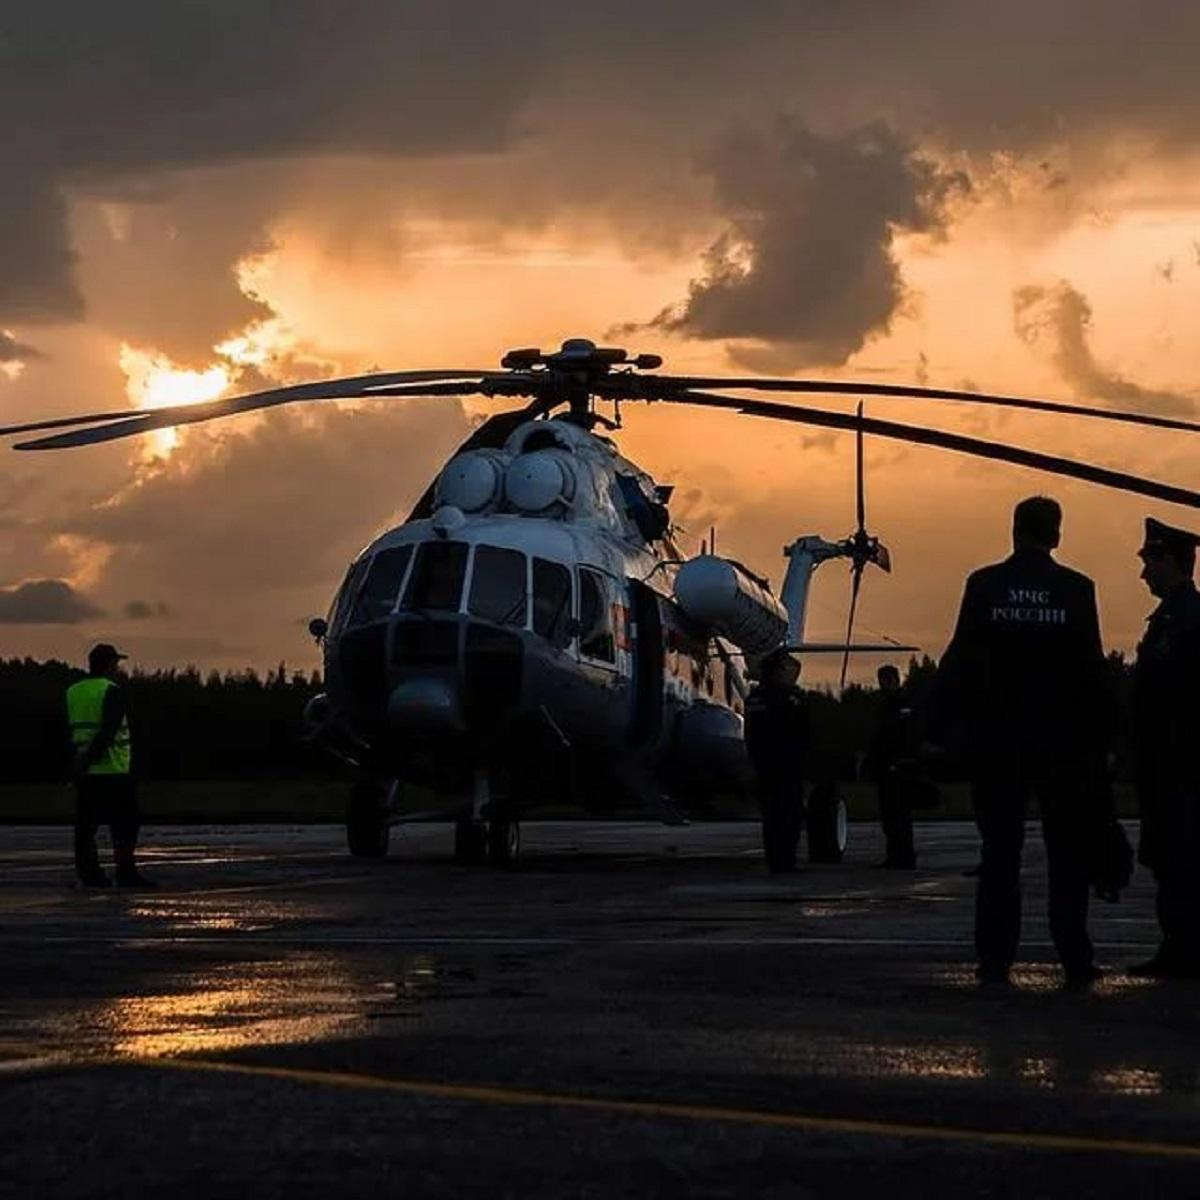 Крушение самолета L-410 в Иркутской области